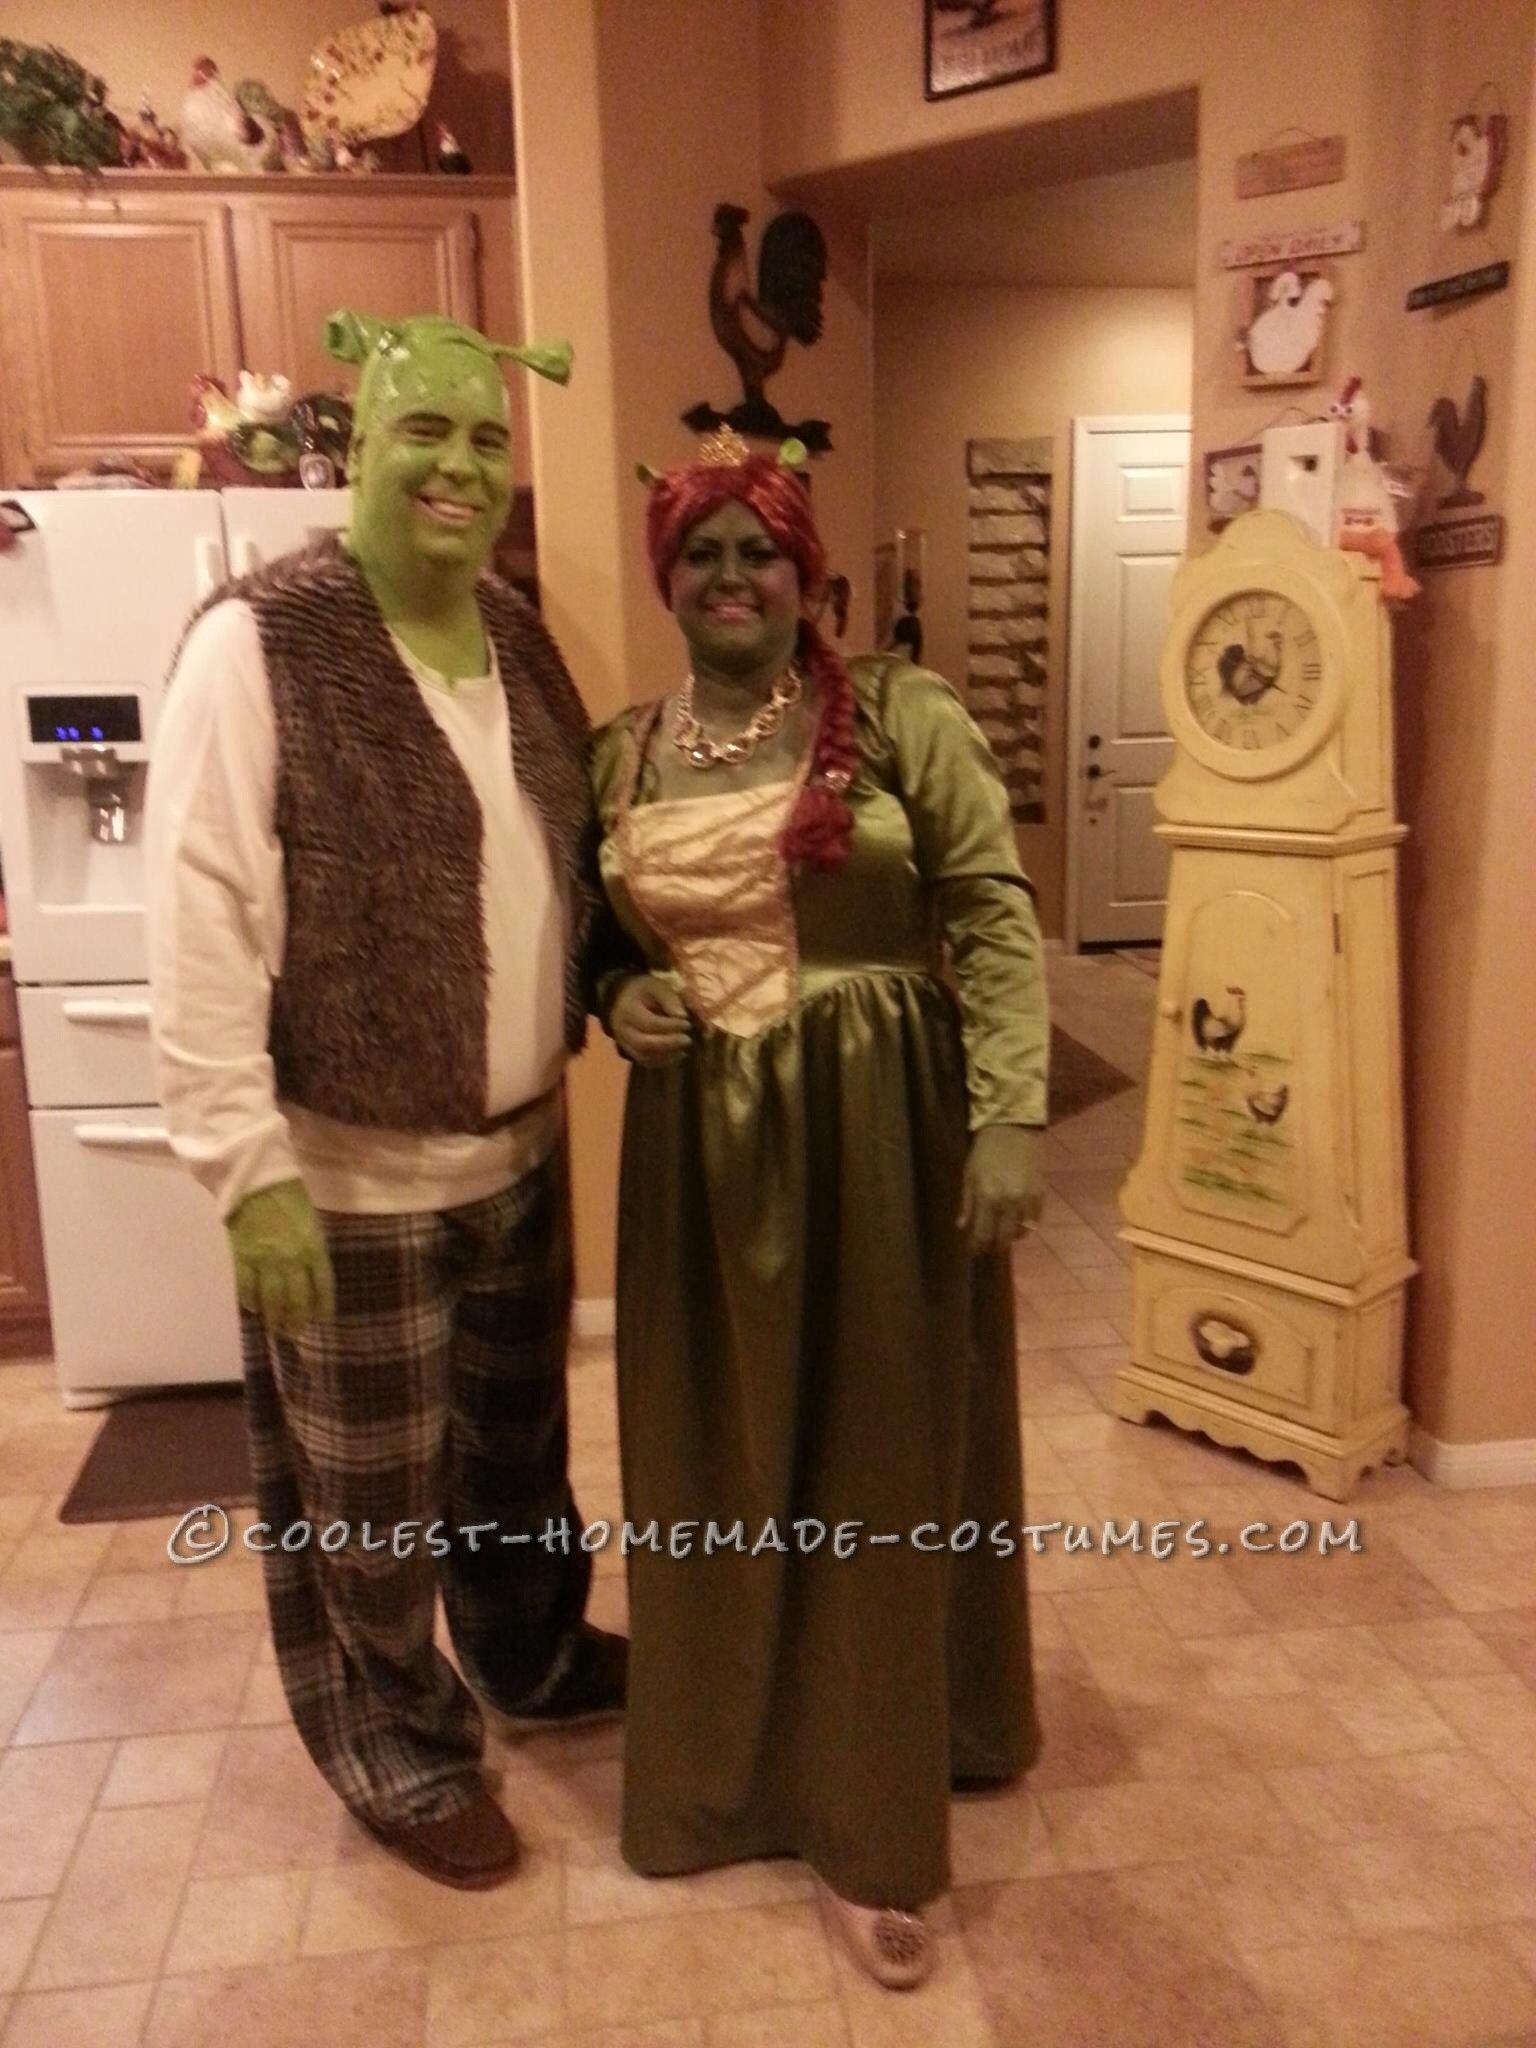 Awesome Homemade Plus-Size Fiona and Shrek Costume   Homemade ...